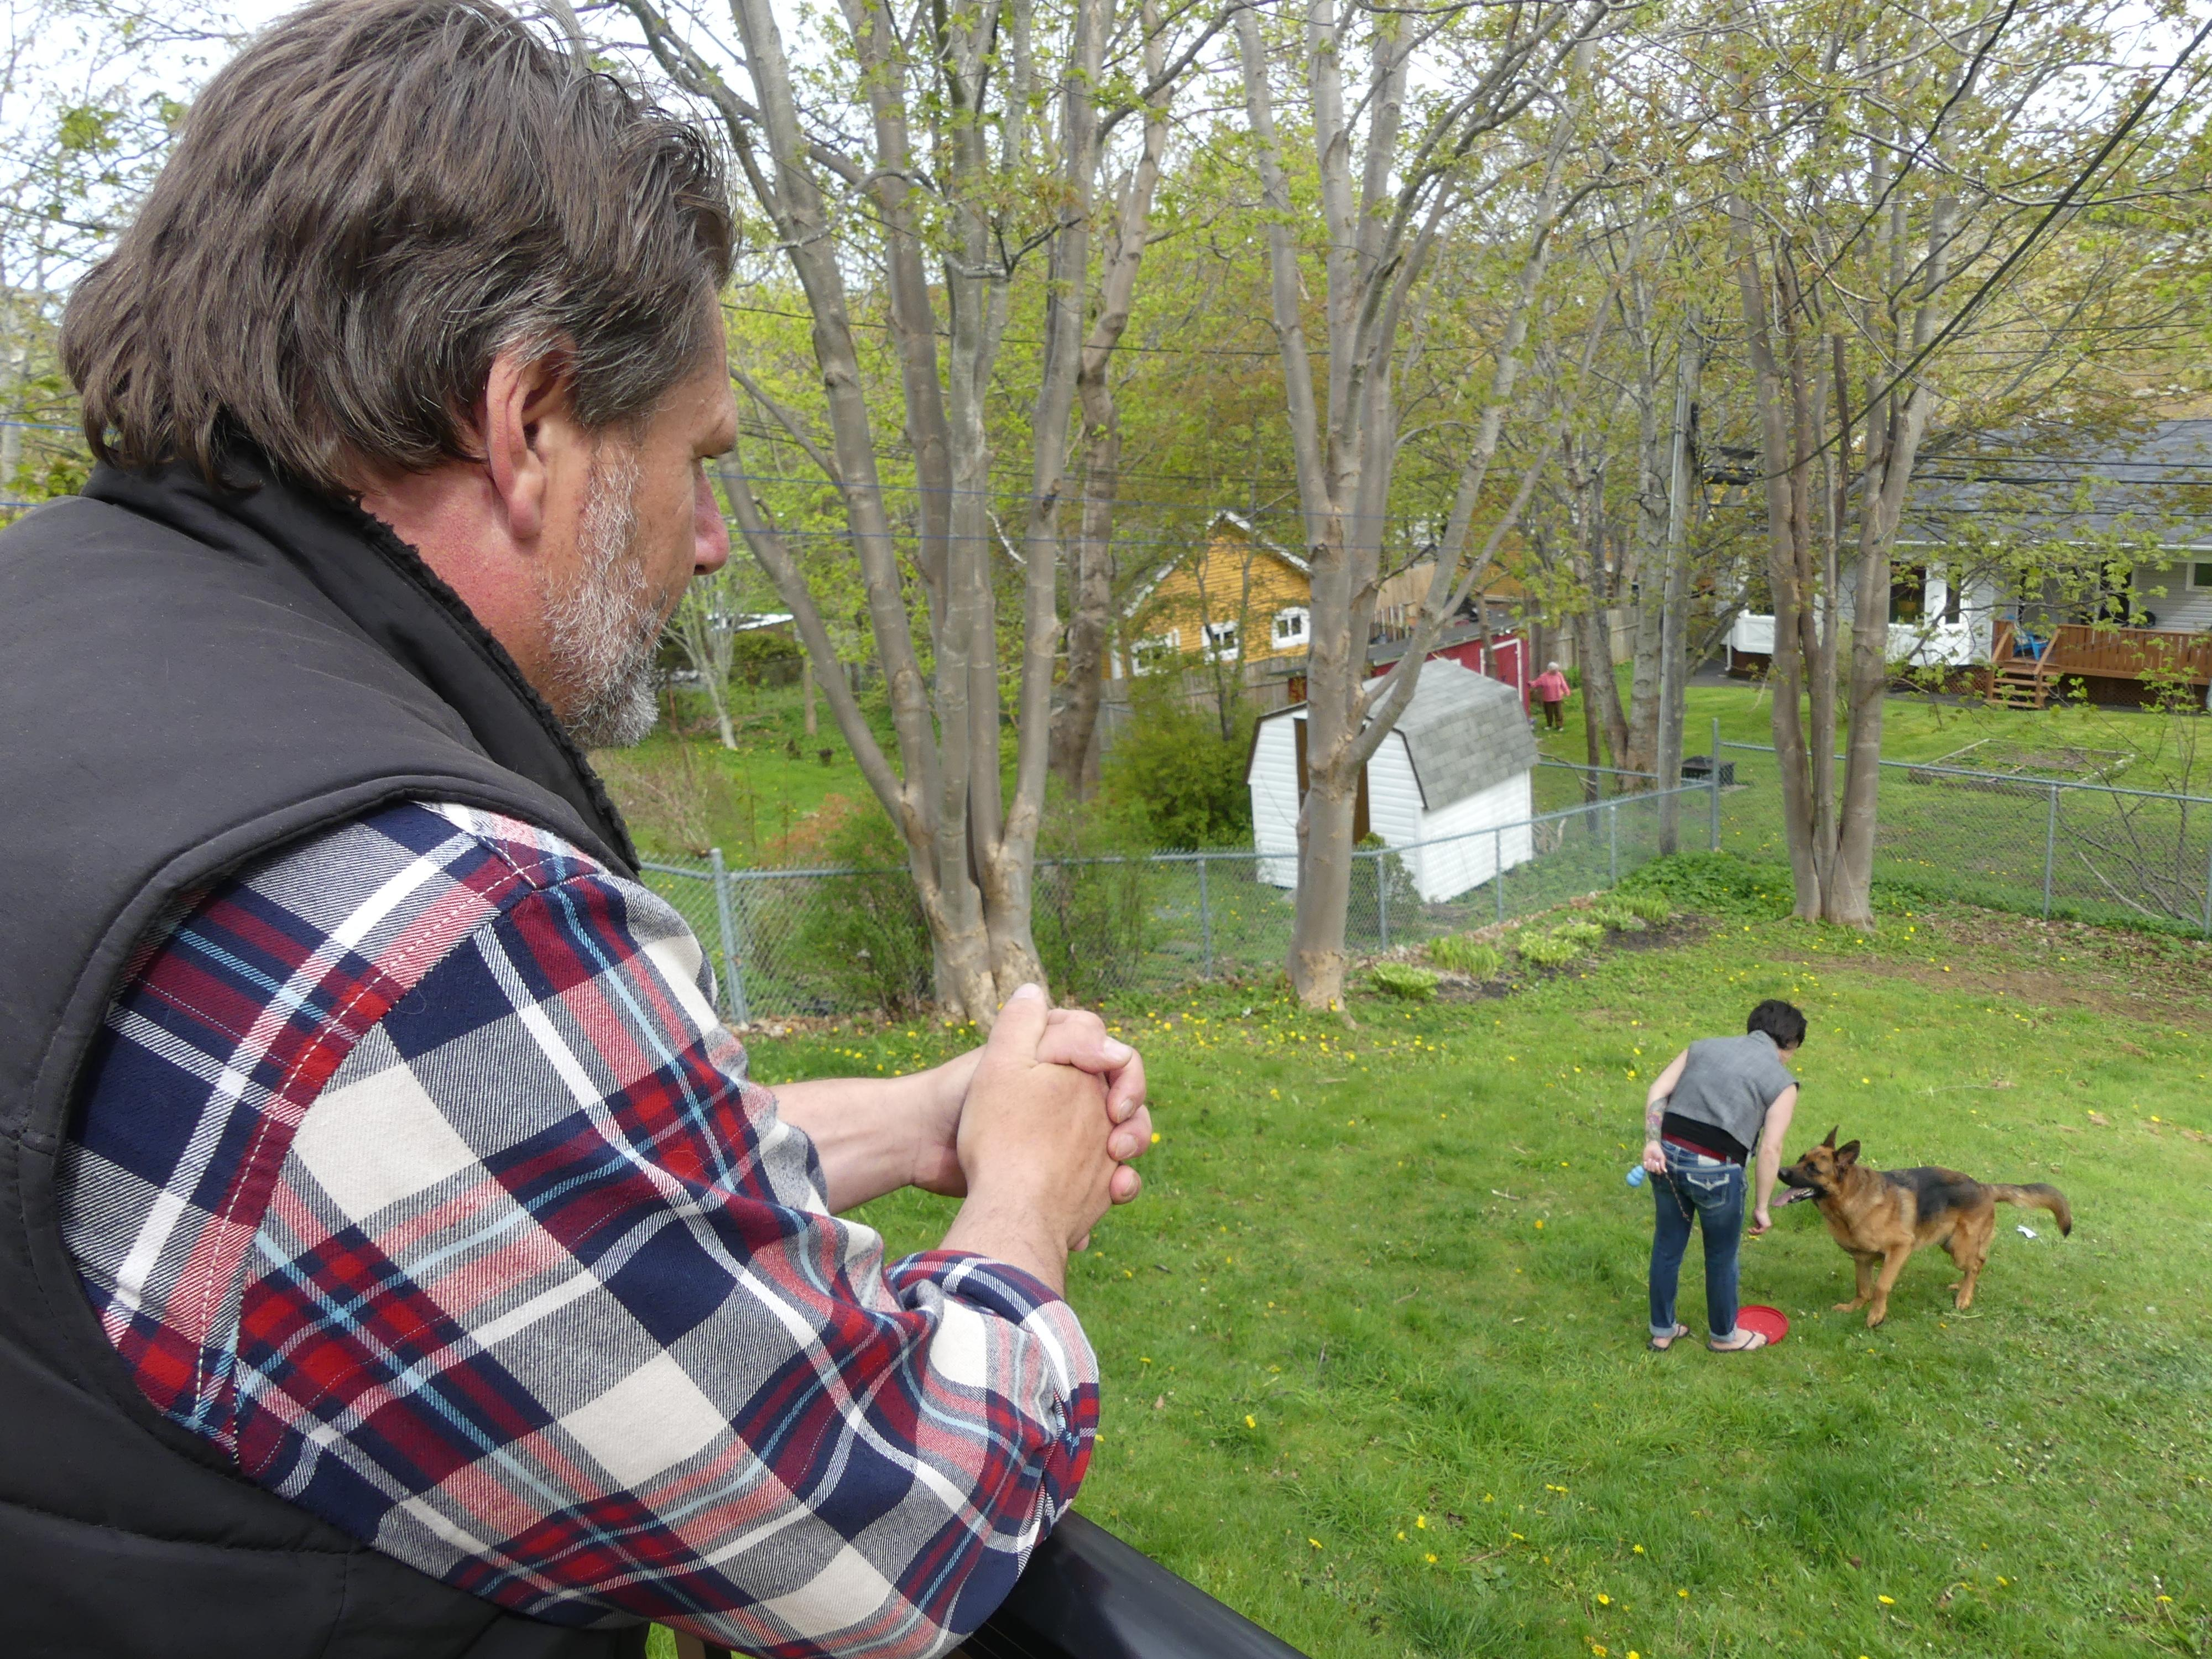 Animal trainer Glenn Redmond has been training Tori to be a service dog. (Ariana Kelland/CBC)